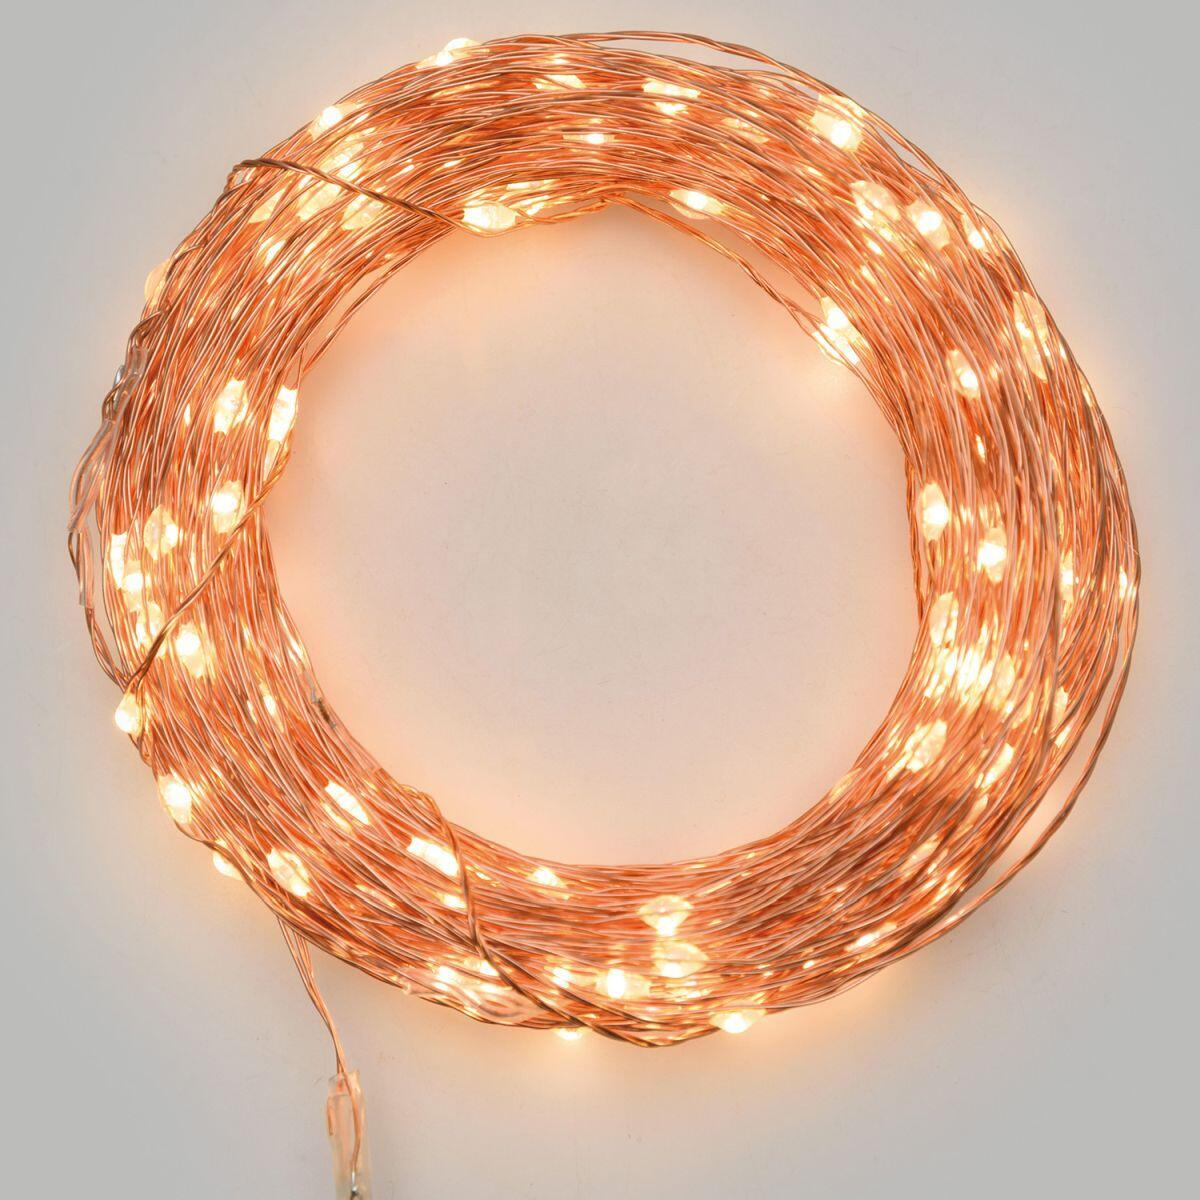 Catena luminosa 500 lampadine LED bianco caldo 37.5 m - 1